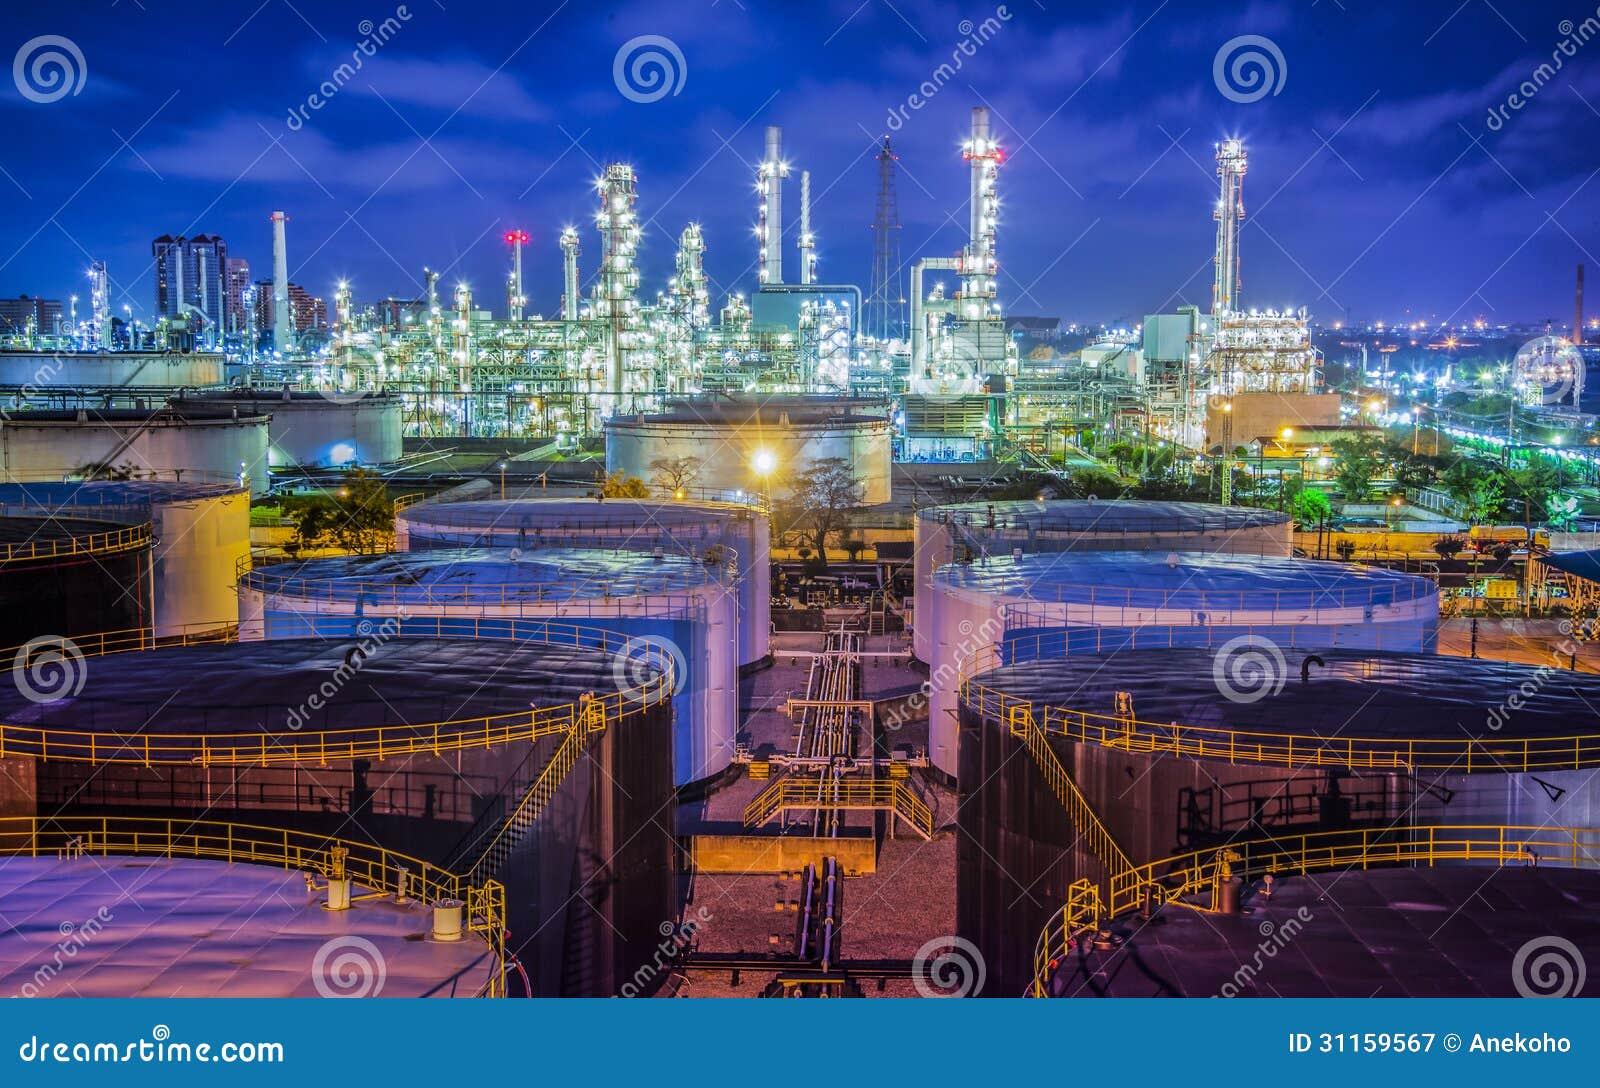 油refinary产业